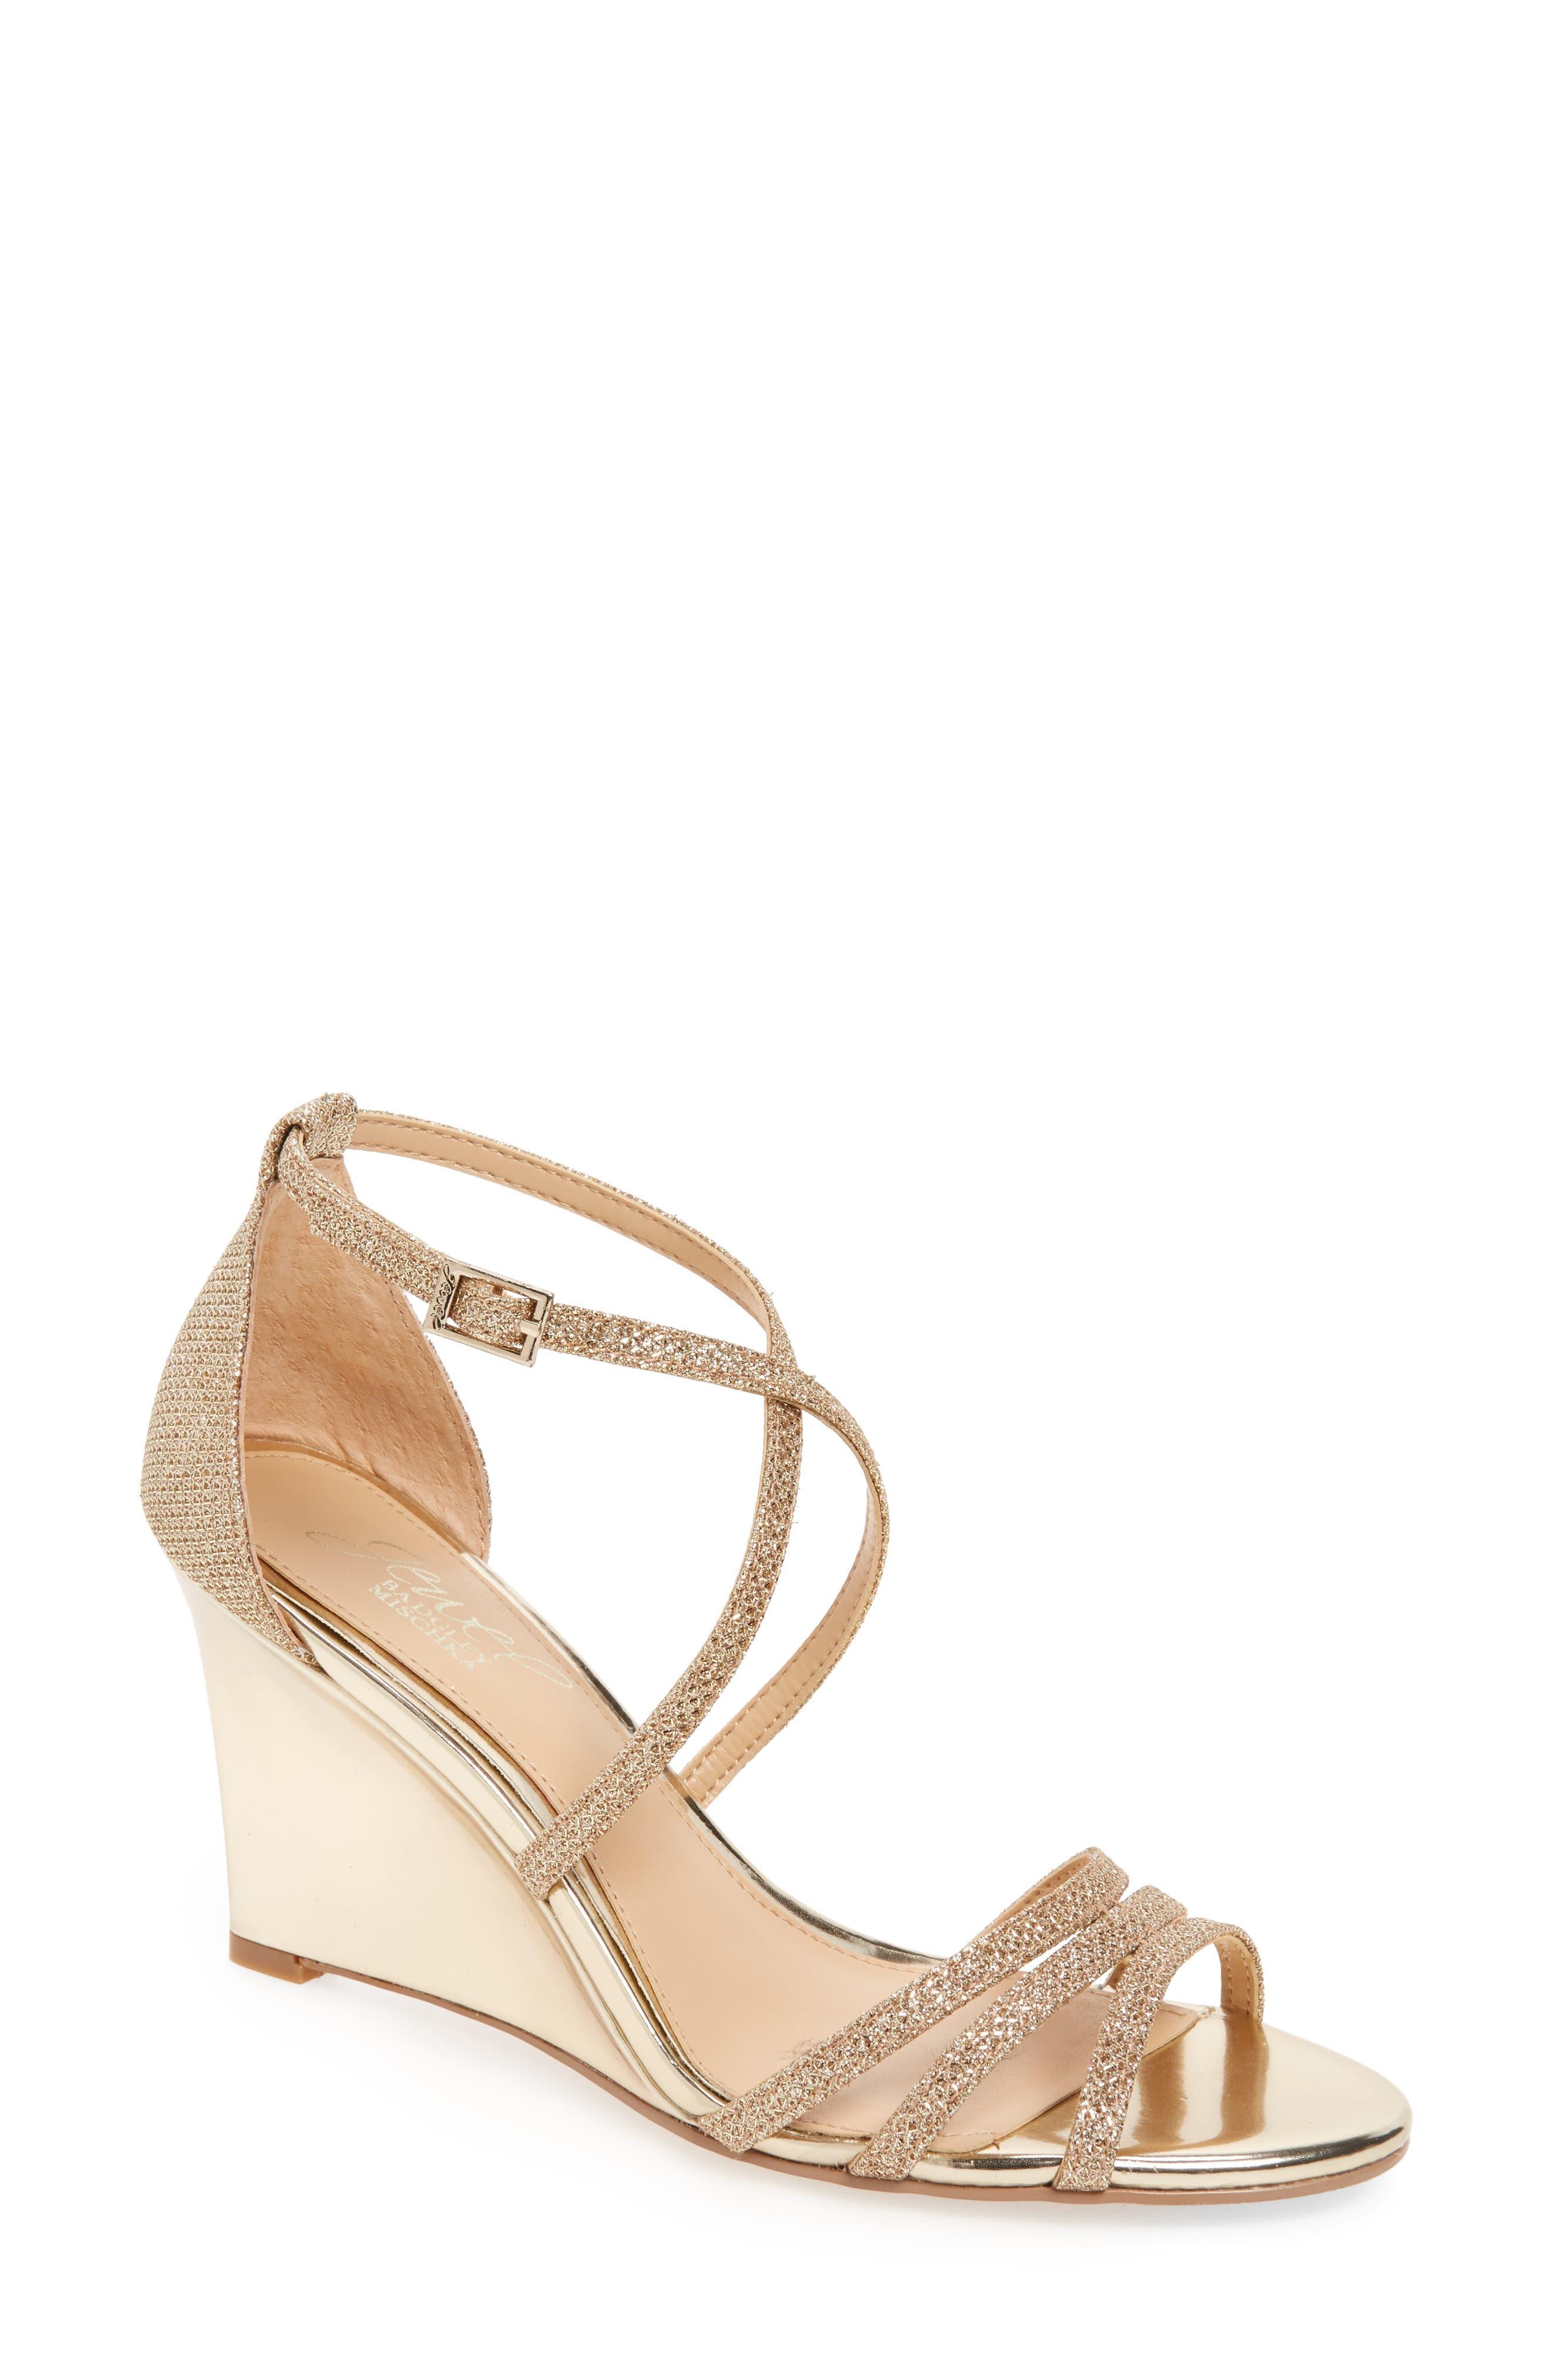 Main Image - Jewel Badgley Mischka Hunt Glittery Wedge Sandal (Women)